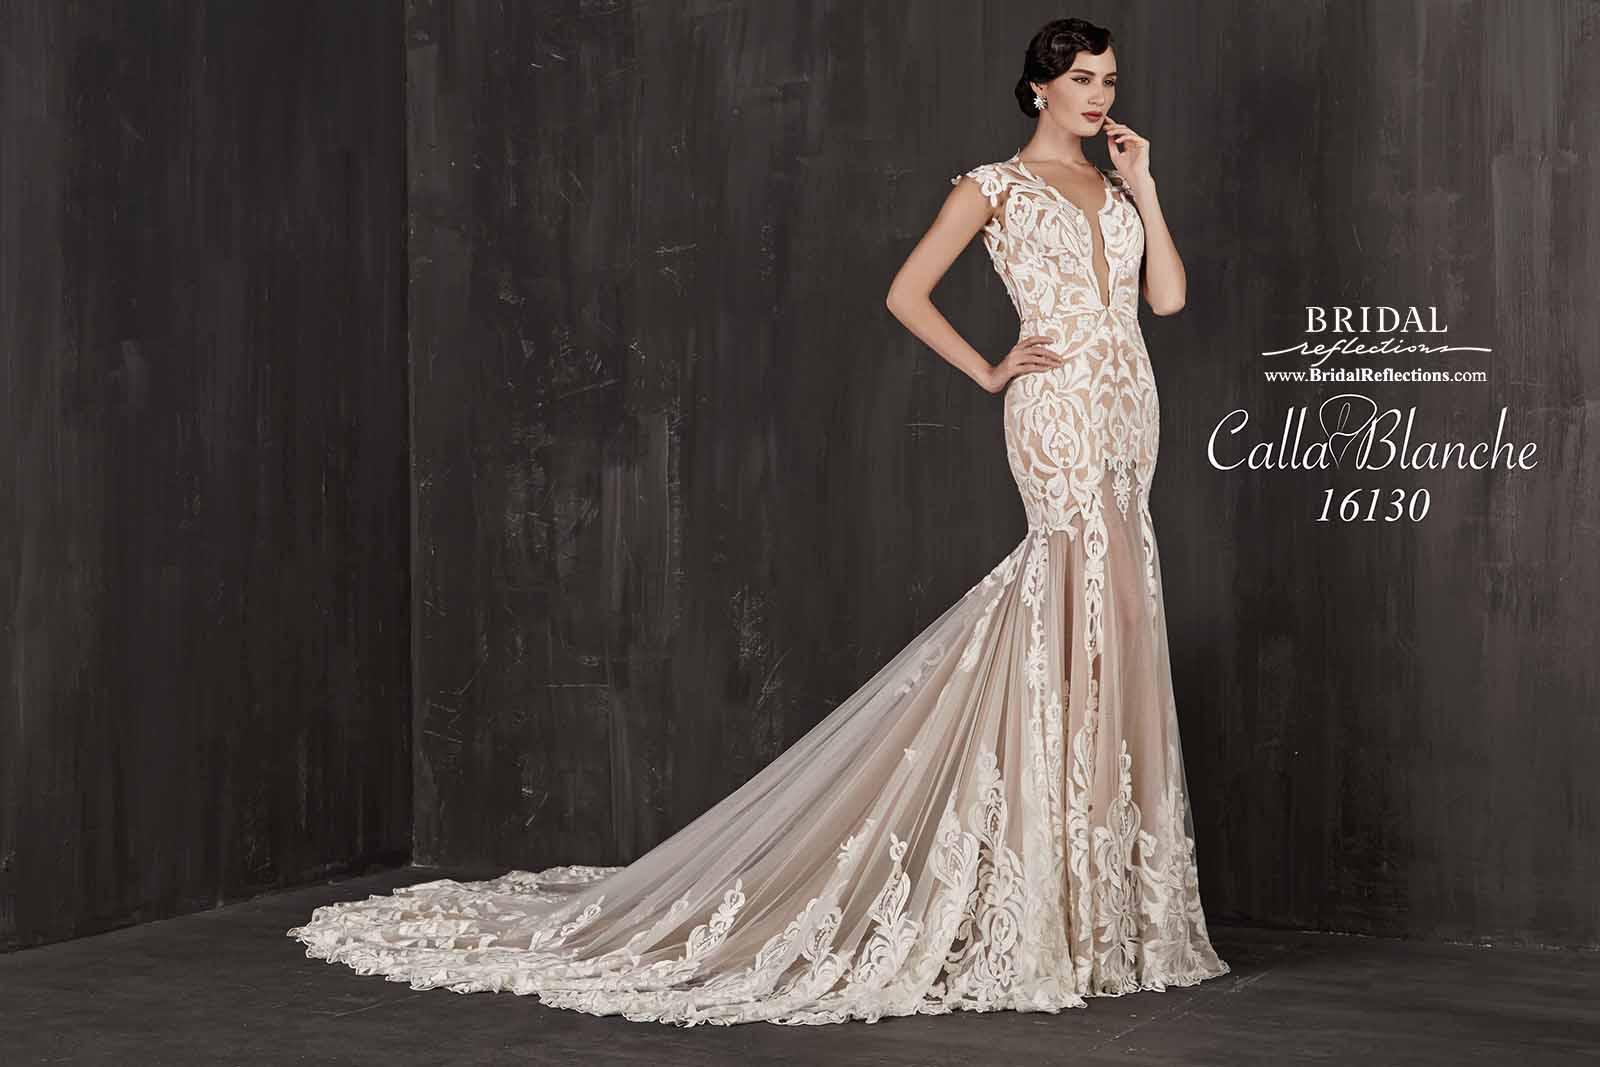 Calla Blanche Wedding Dress Collection Bridal Reflections